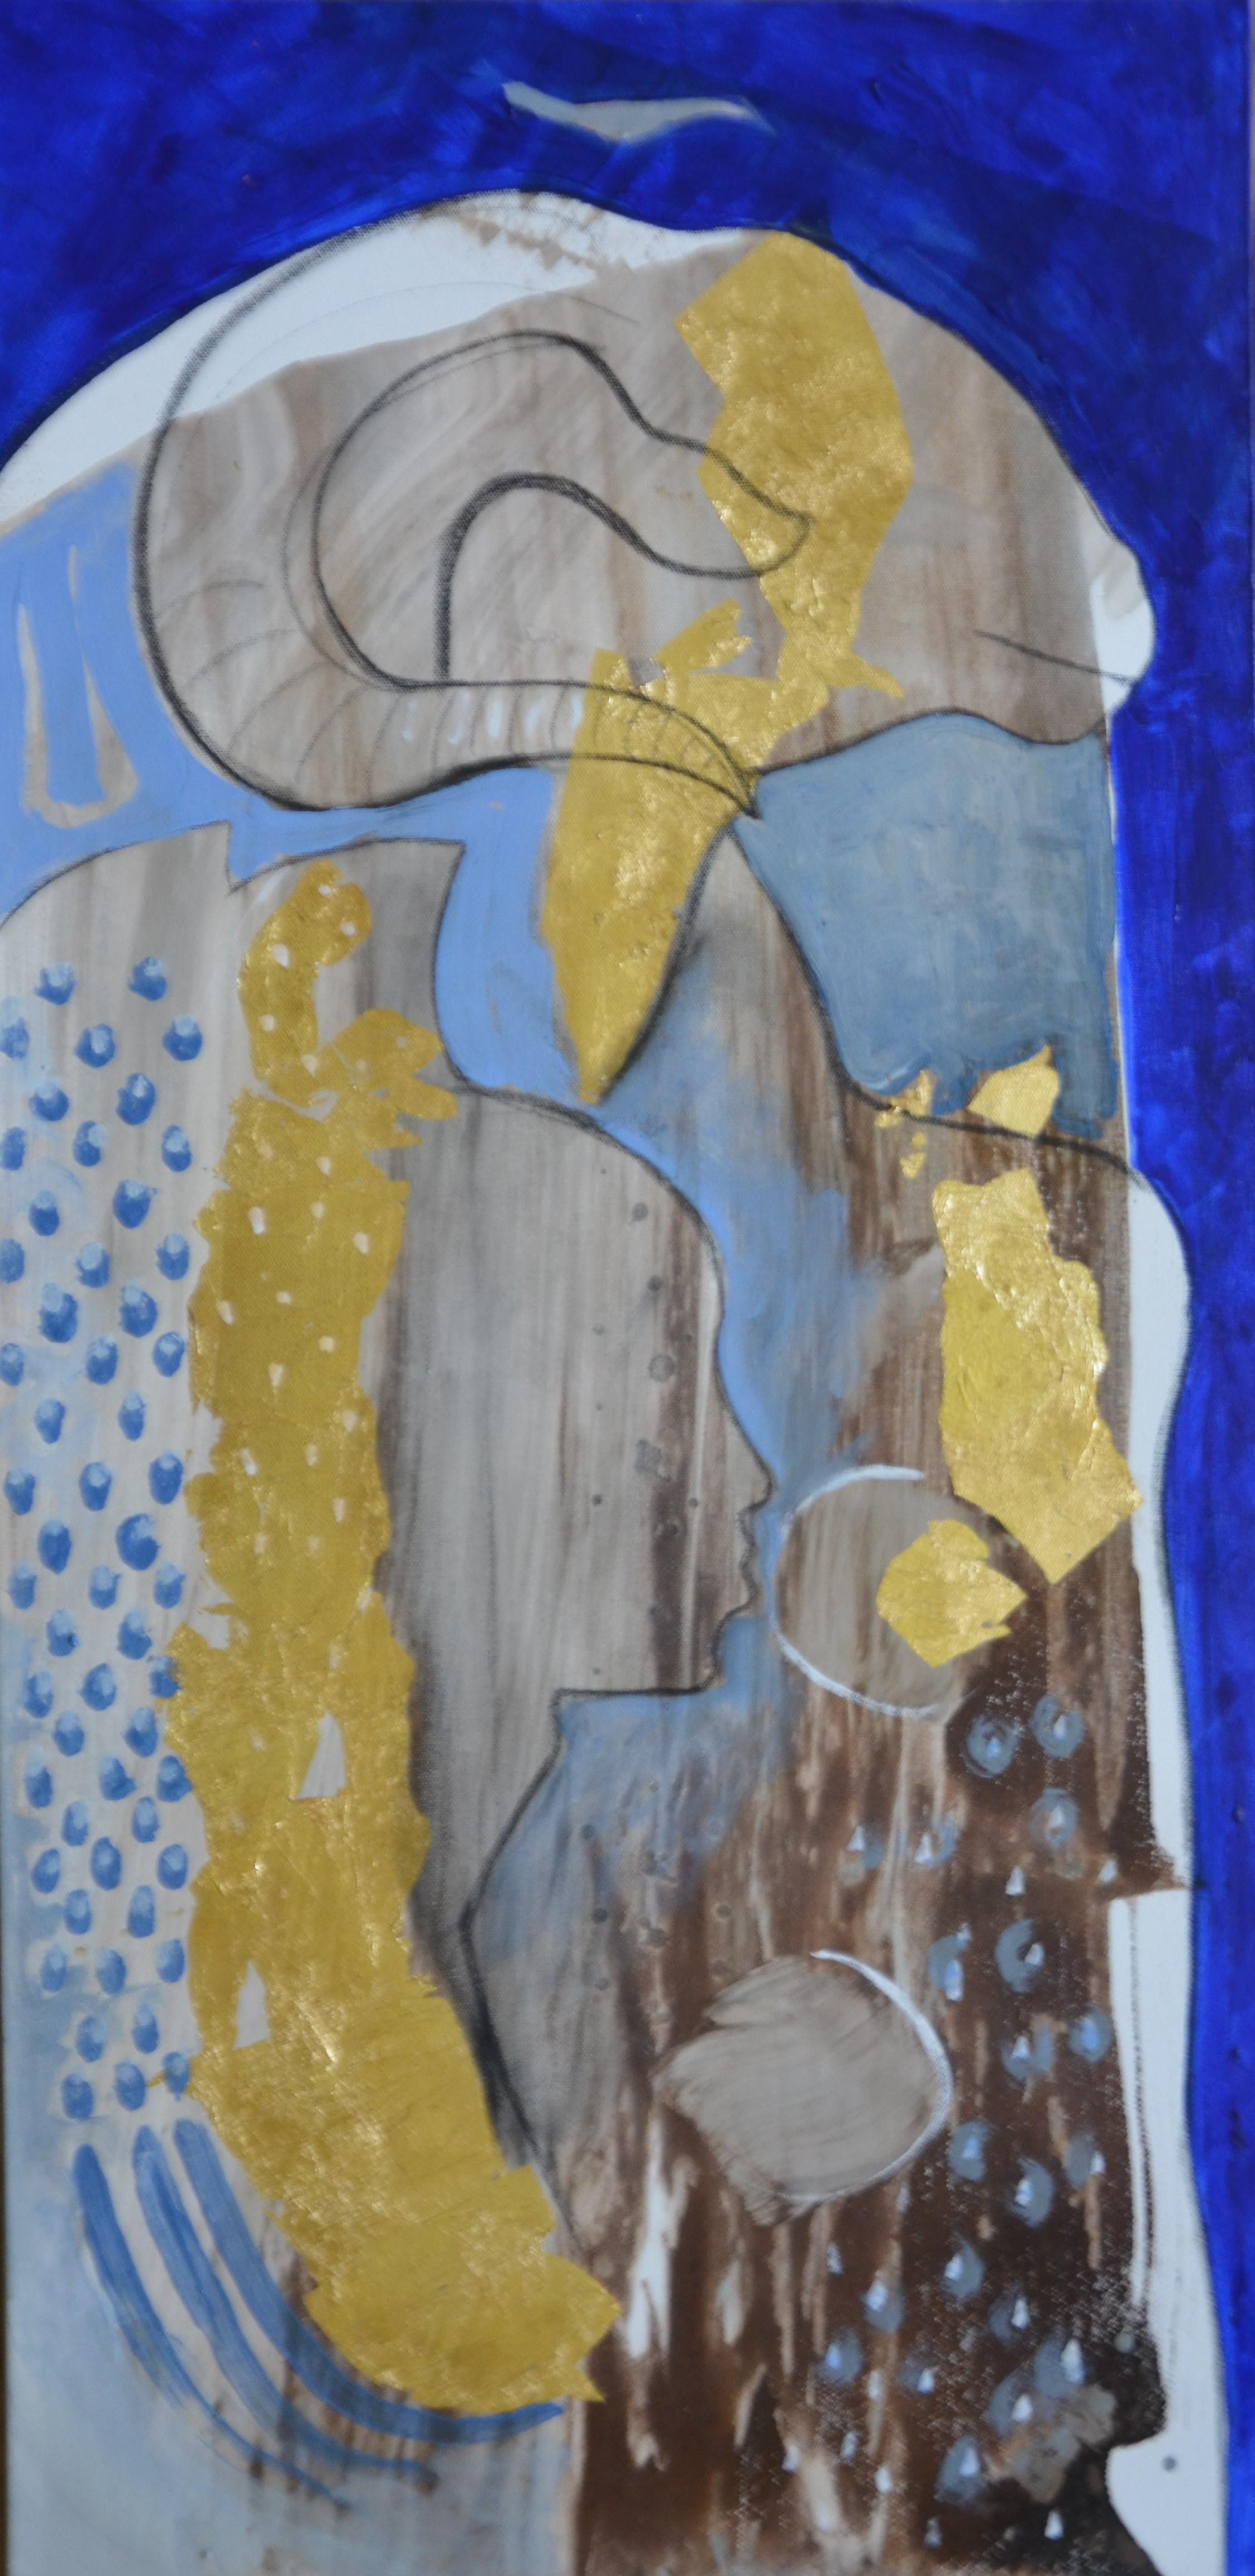 Khenmu acrylic, tempera and gold leaf canvas, 36 x 18 Inch, 2017